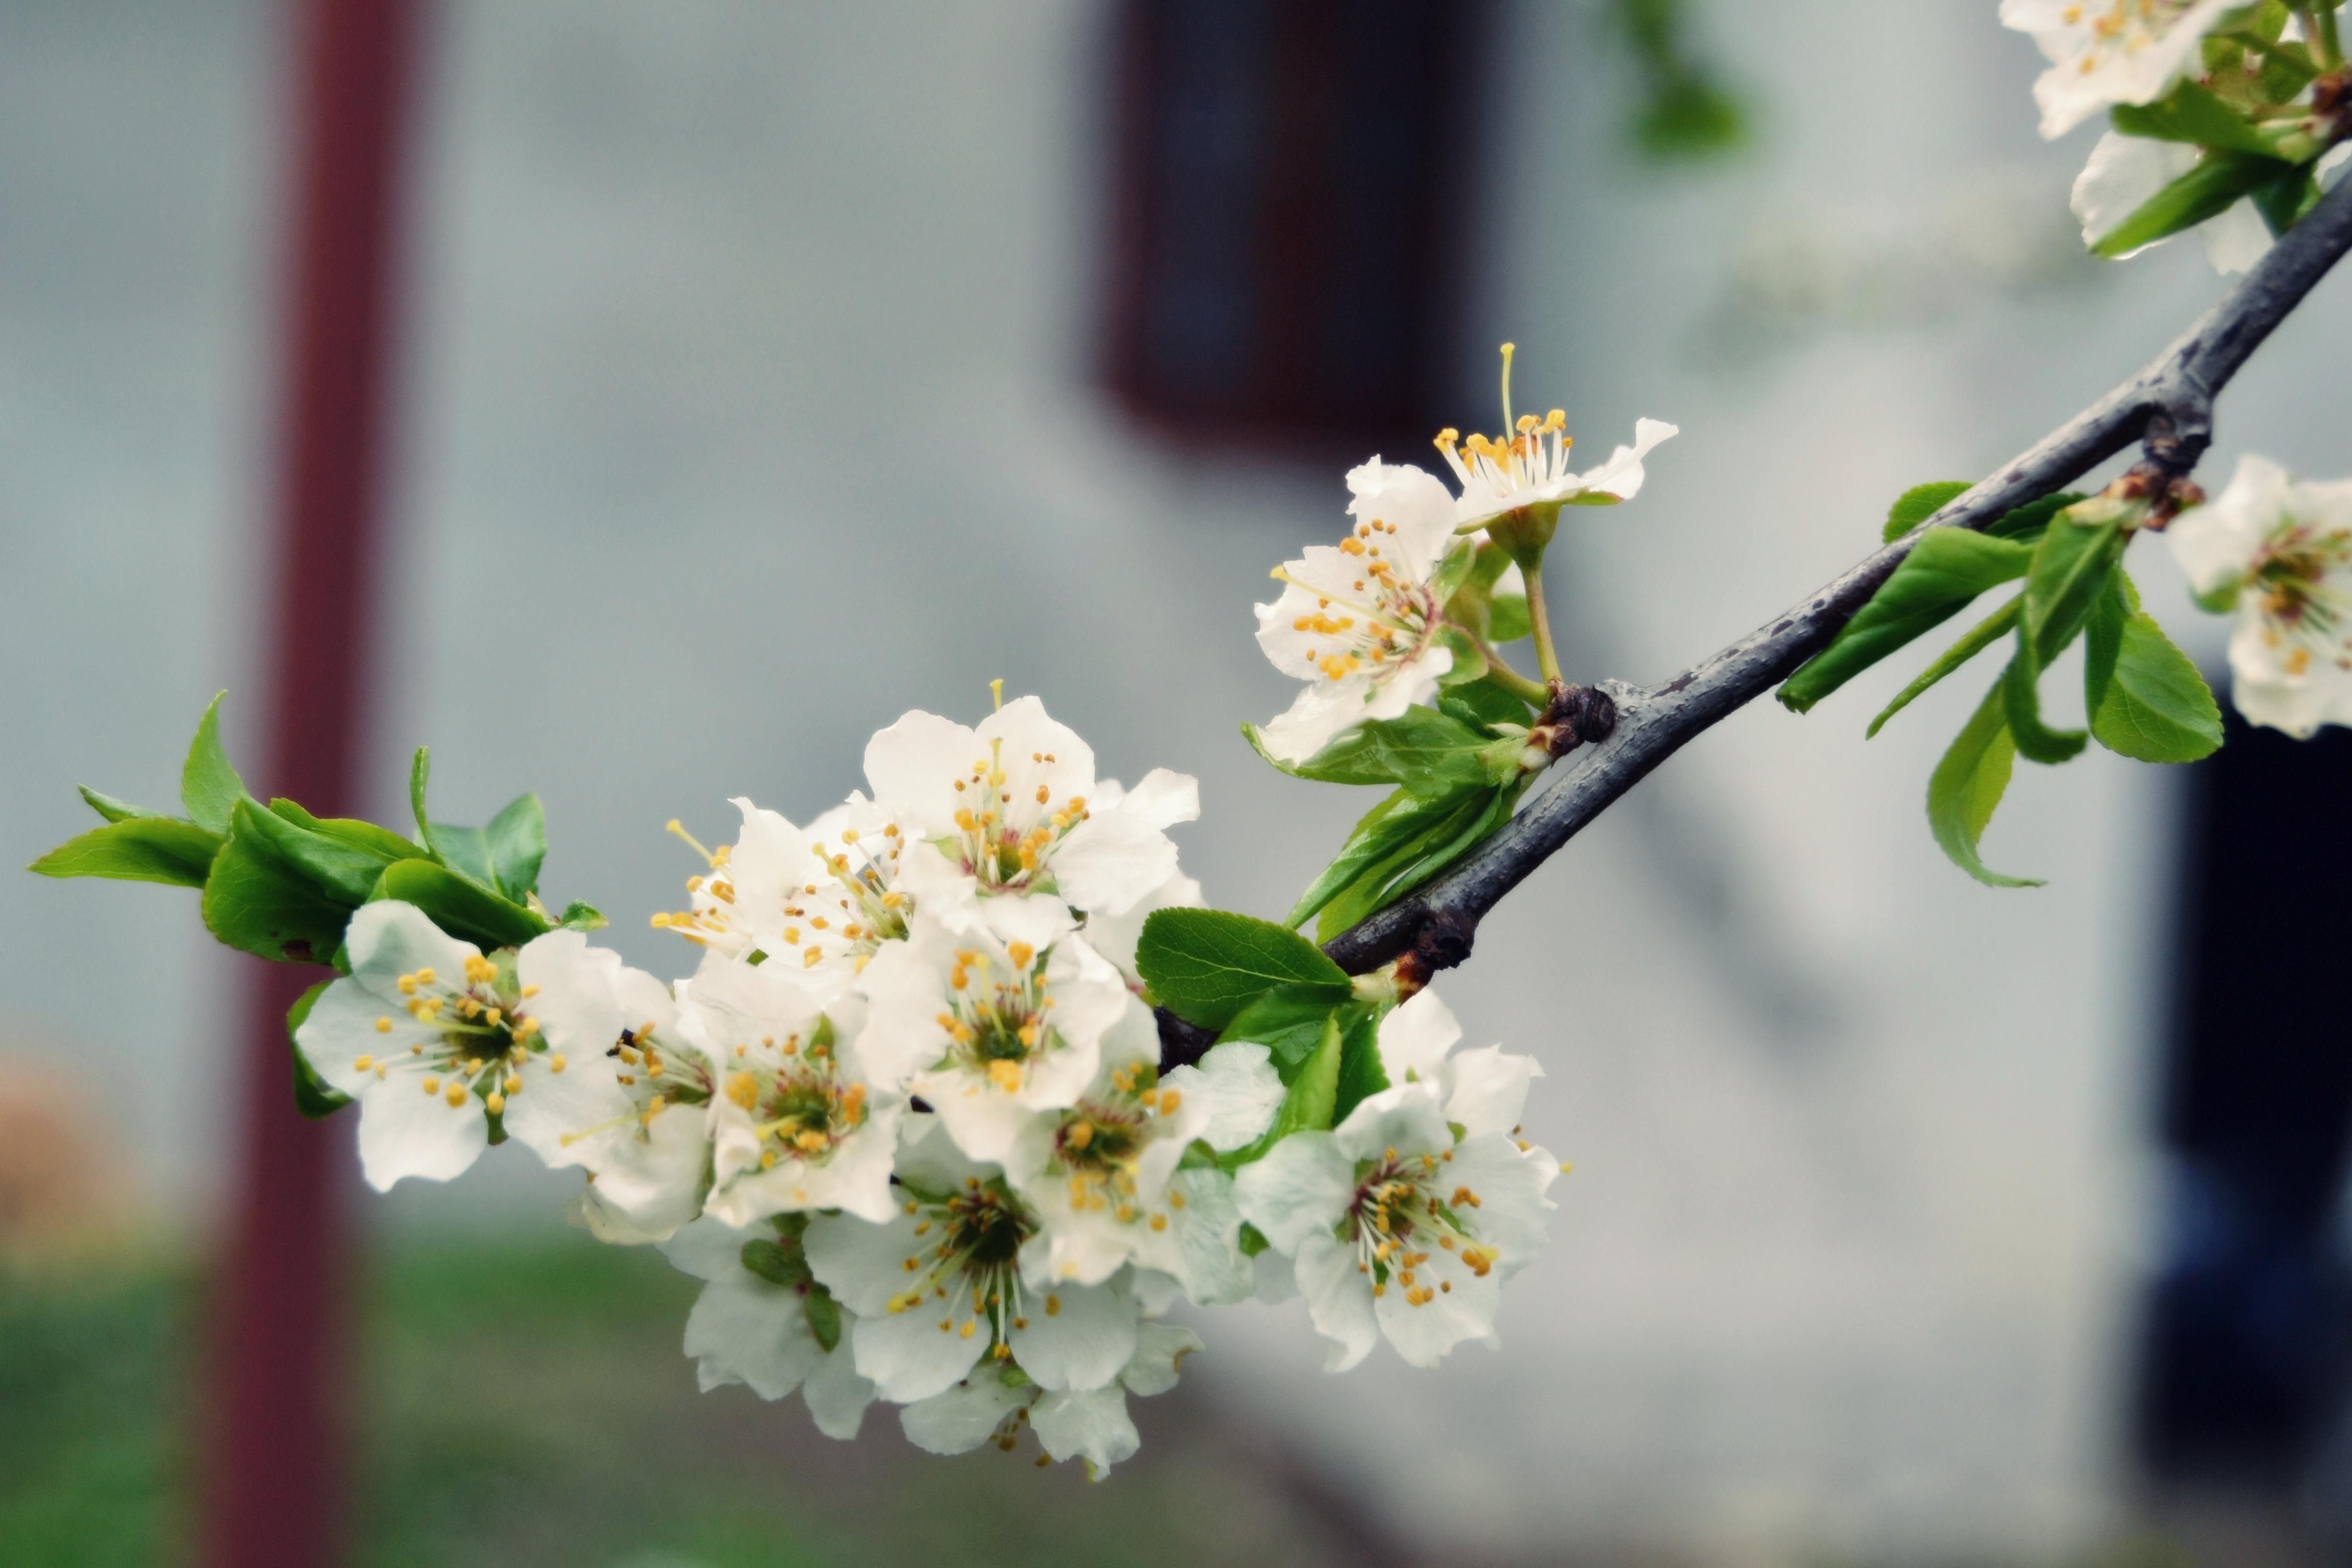 flori-de-zarzar-3_3de9f2b1dc817d